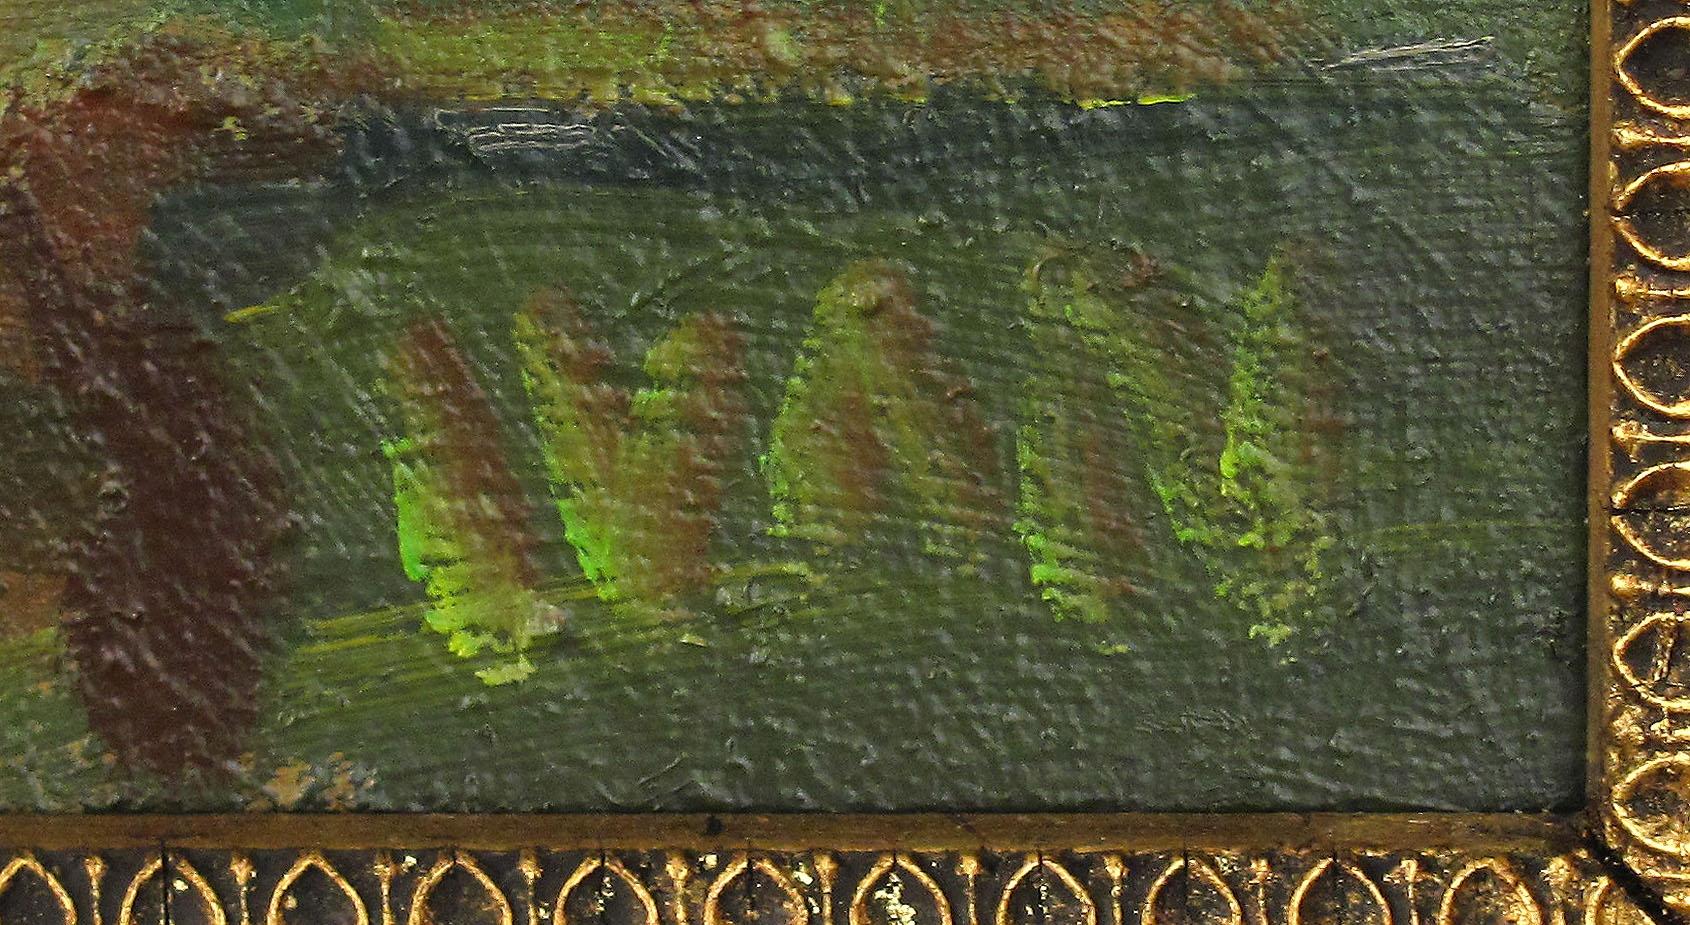 19-9s.jpg (1690×925)